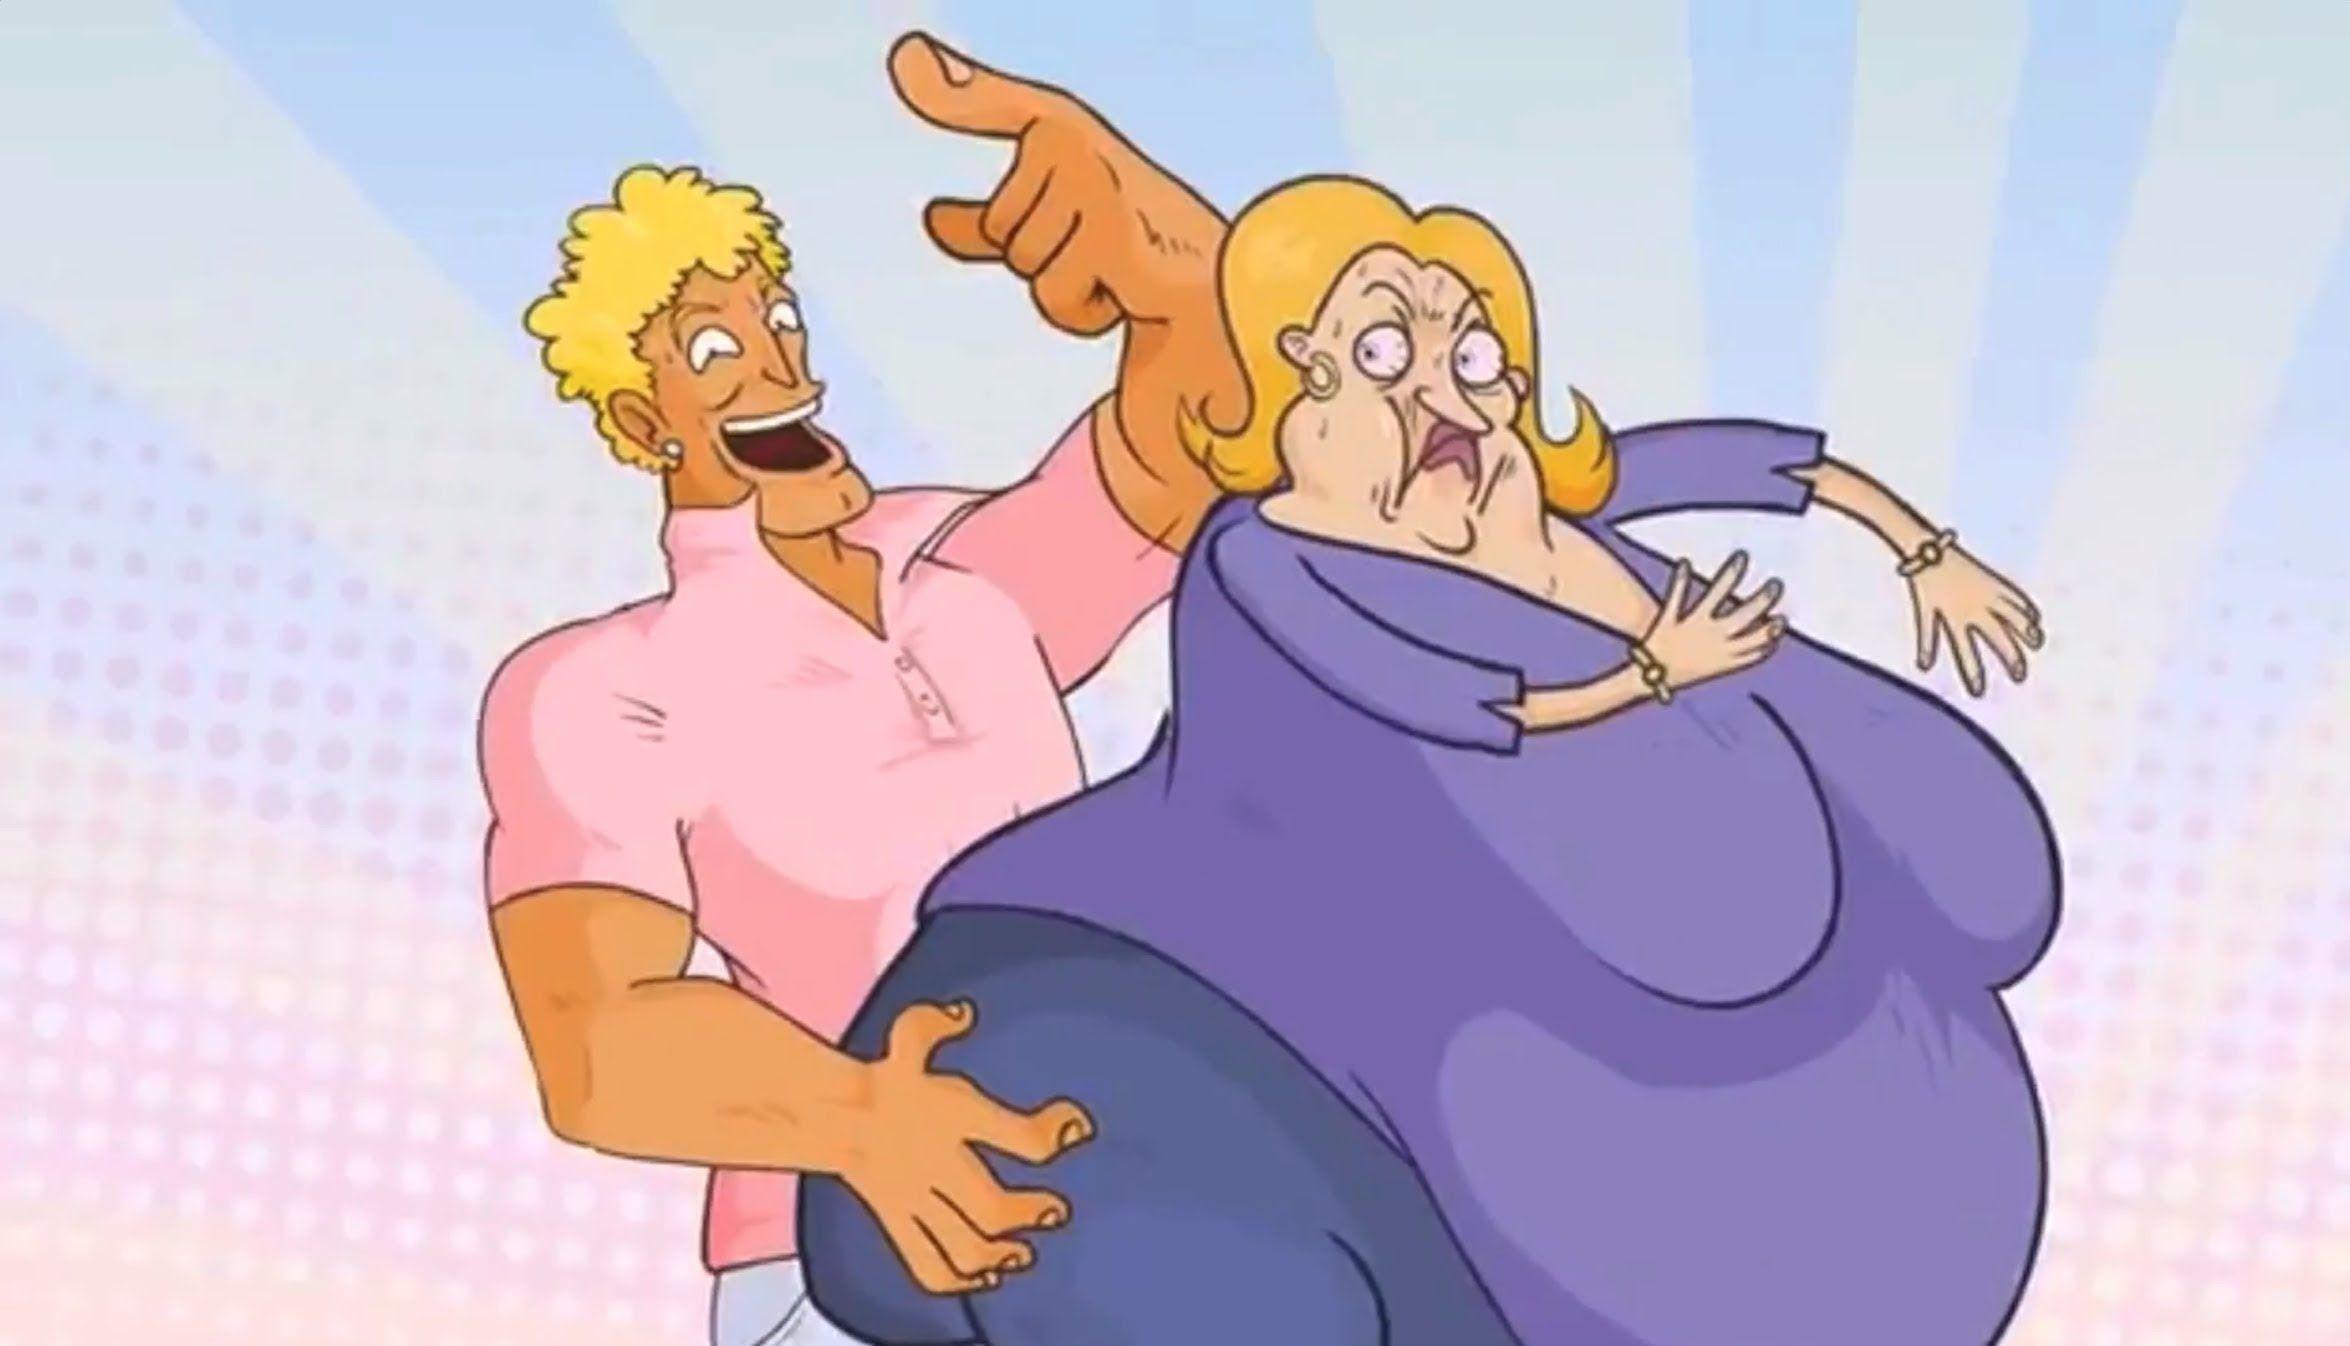 100 Yo Mama Jokes - Can You Watch Them All? (Fat Mama F**k)